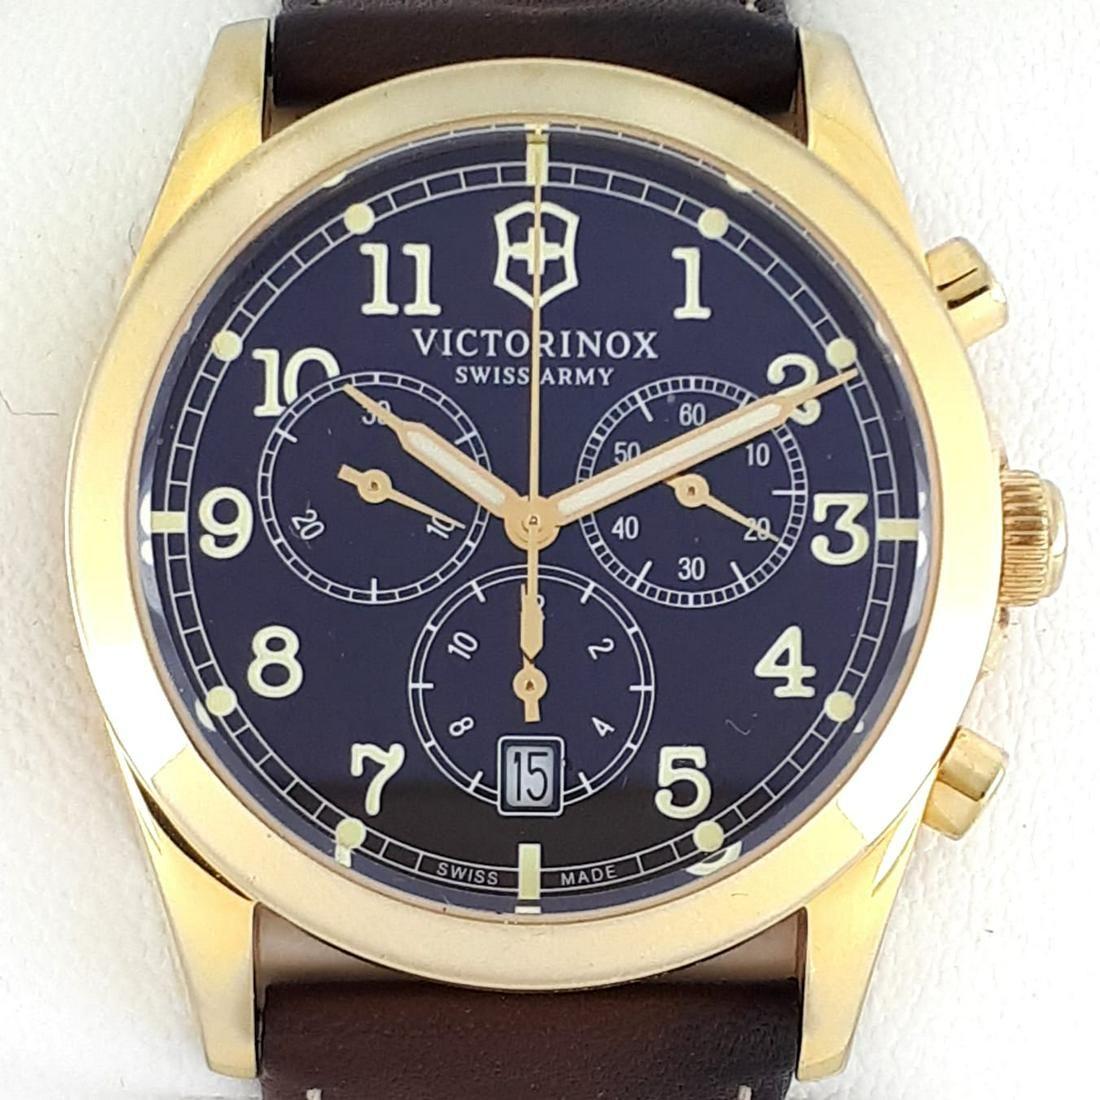 Victorinox Swiss Army - Infantry Chronograph Date -